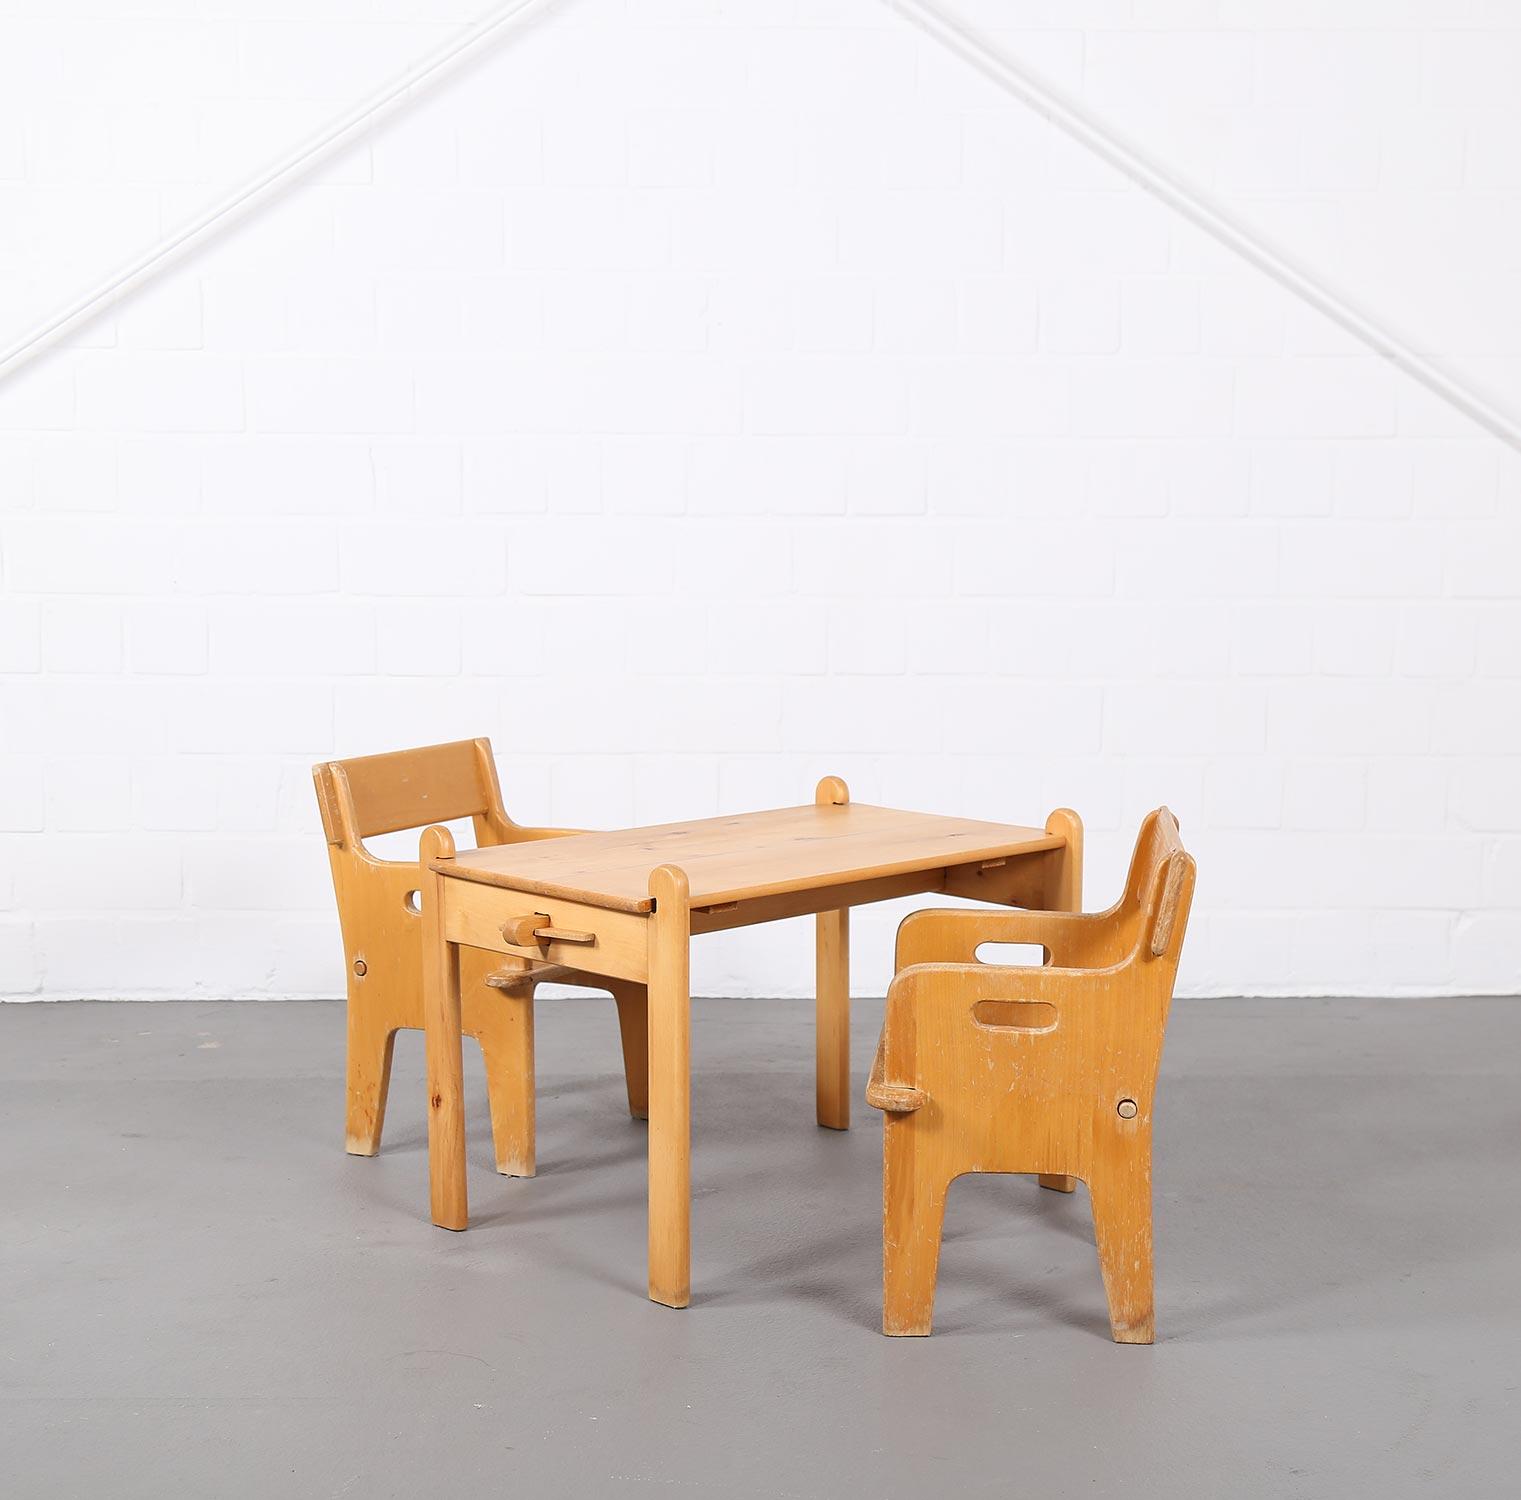 Hans j wegner perts chair peters table danish design borge mogensen kids kinderstuhl - Kinderstuhl design ...